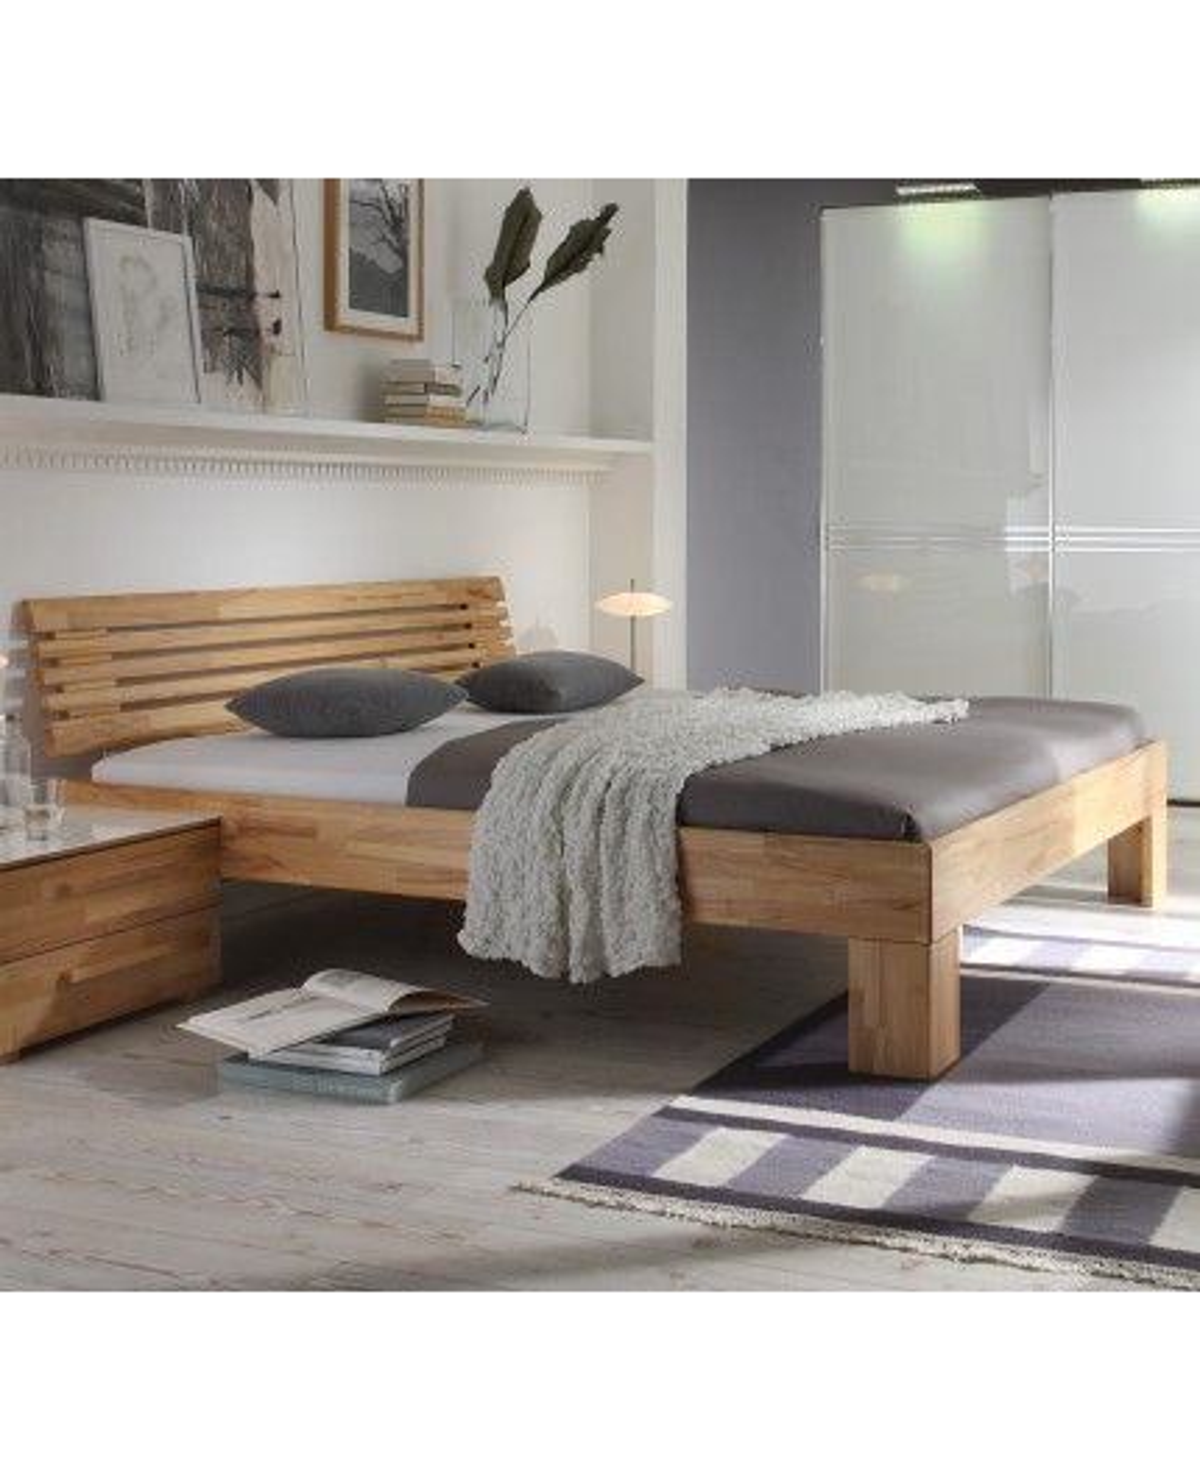 Hasena Wood Line Bett Premium 18 Kernbuche Füße Massa 20 Kopfteil